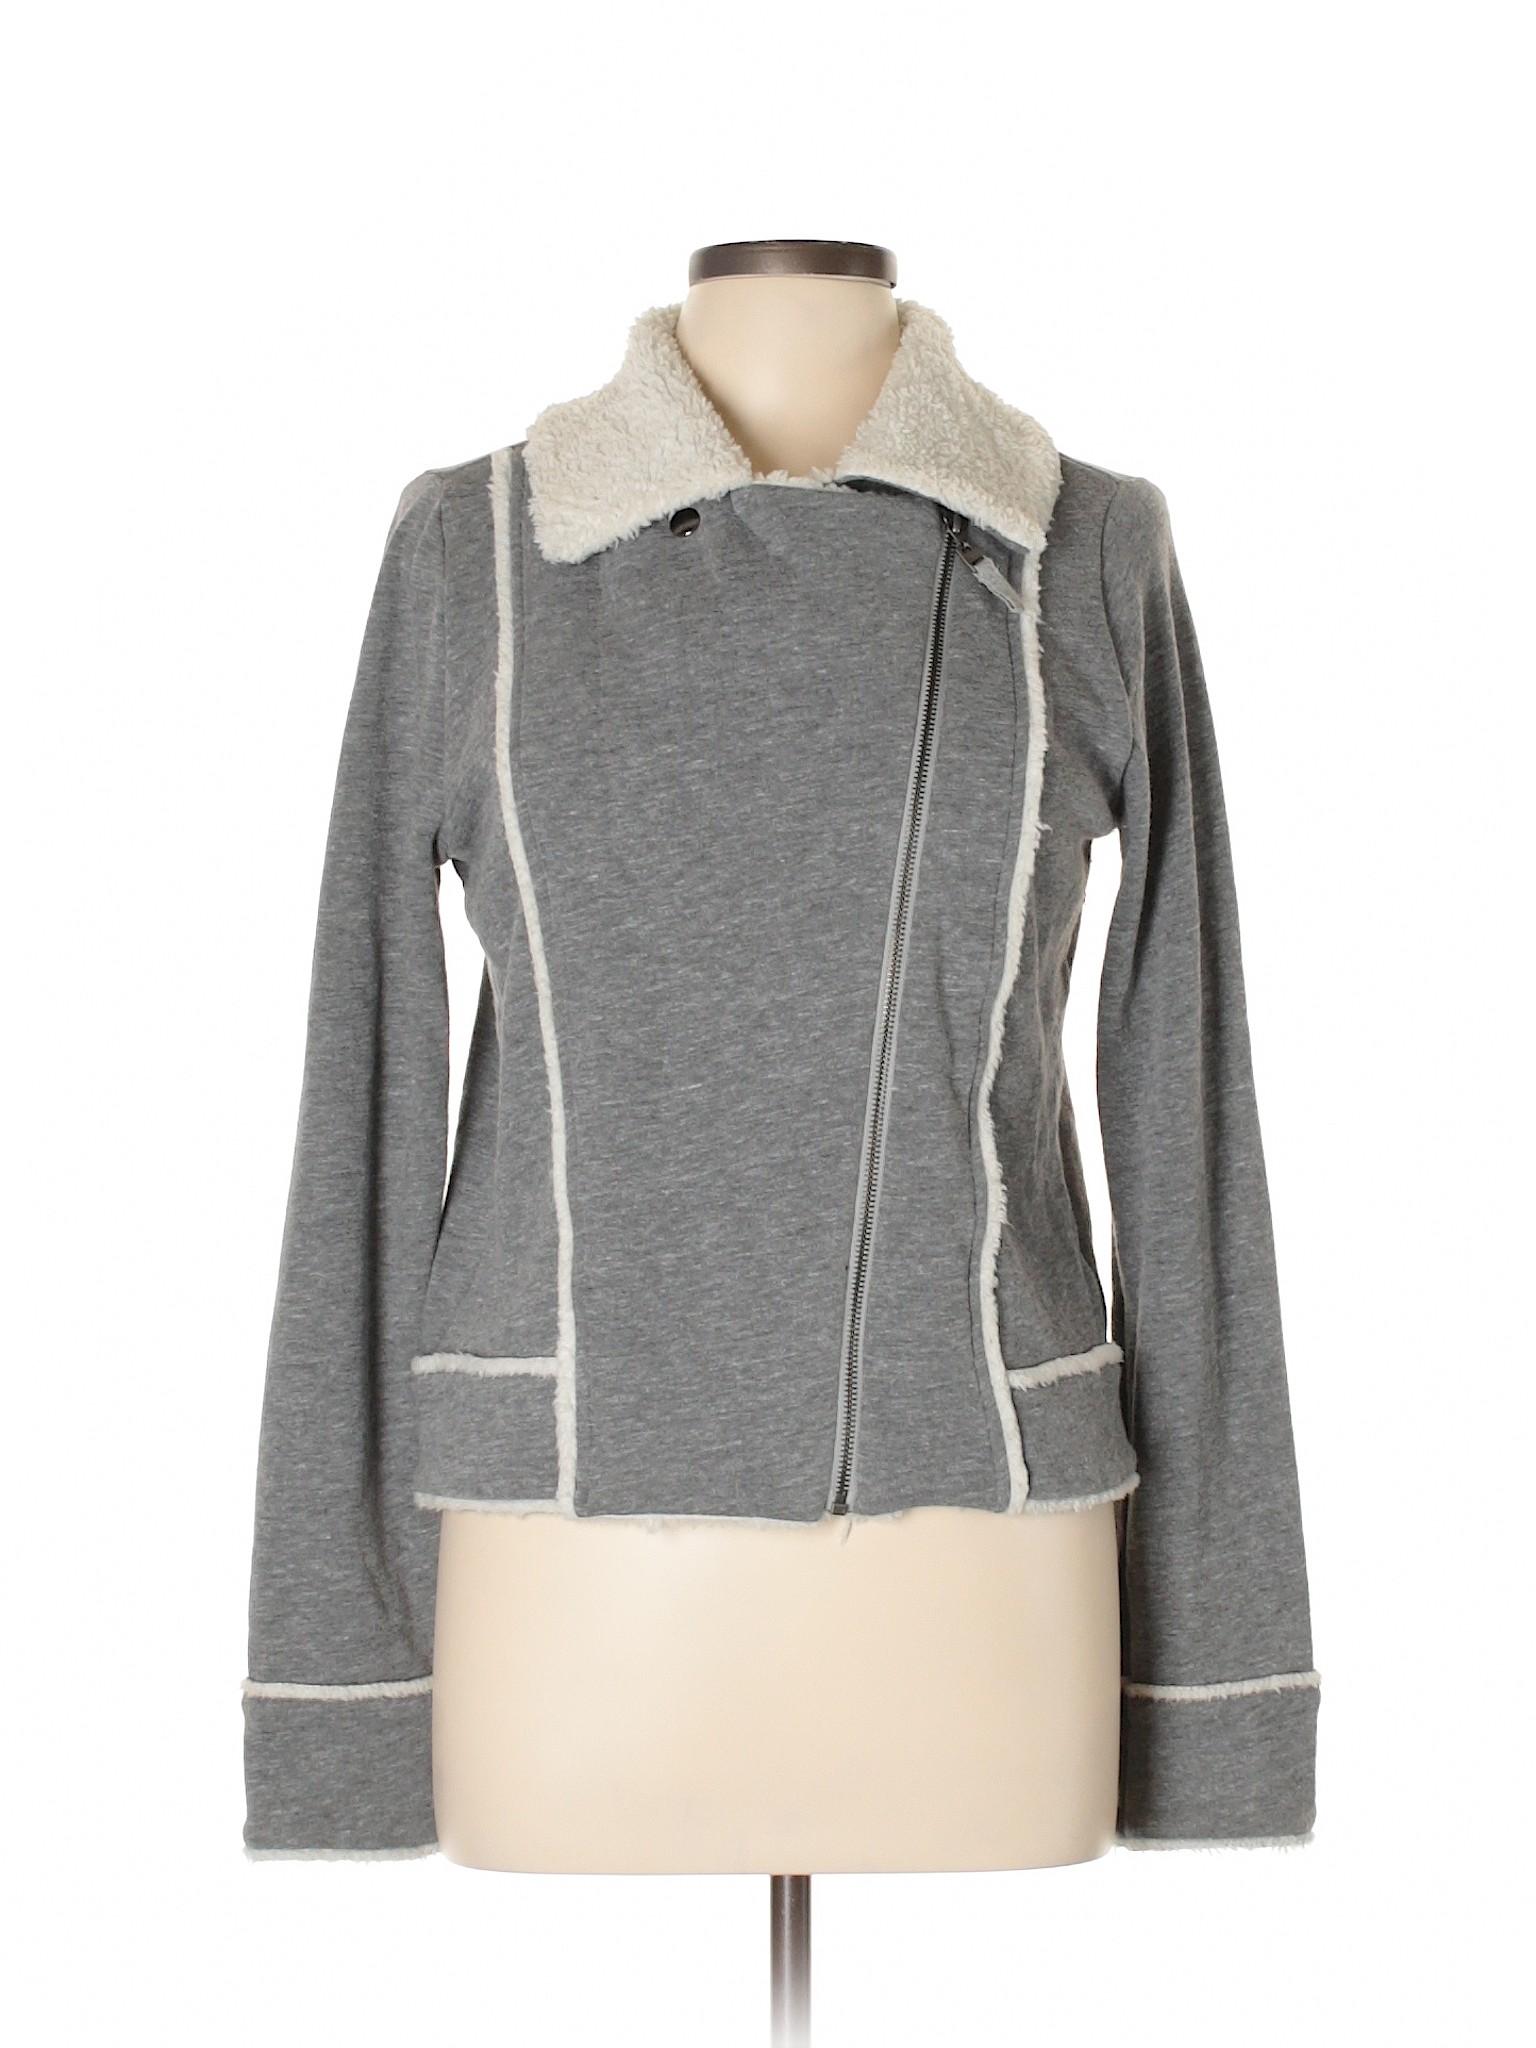 winter winter Jacket Boutique Jacket Boutique Jacket Splendid Boutique Splendid Splendid winter PqE1C7